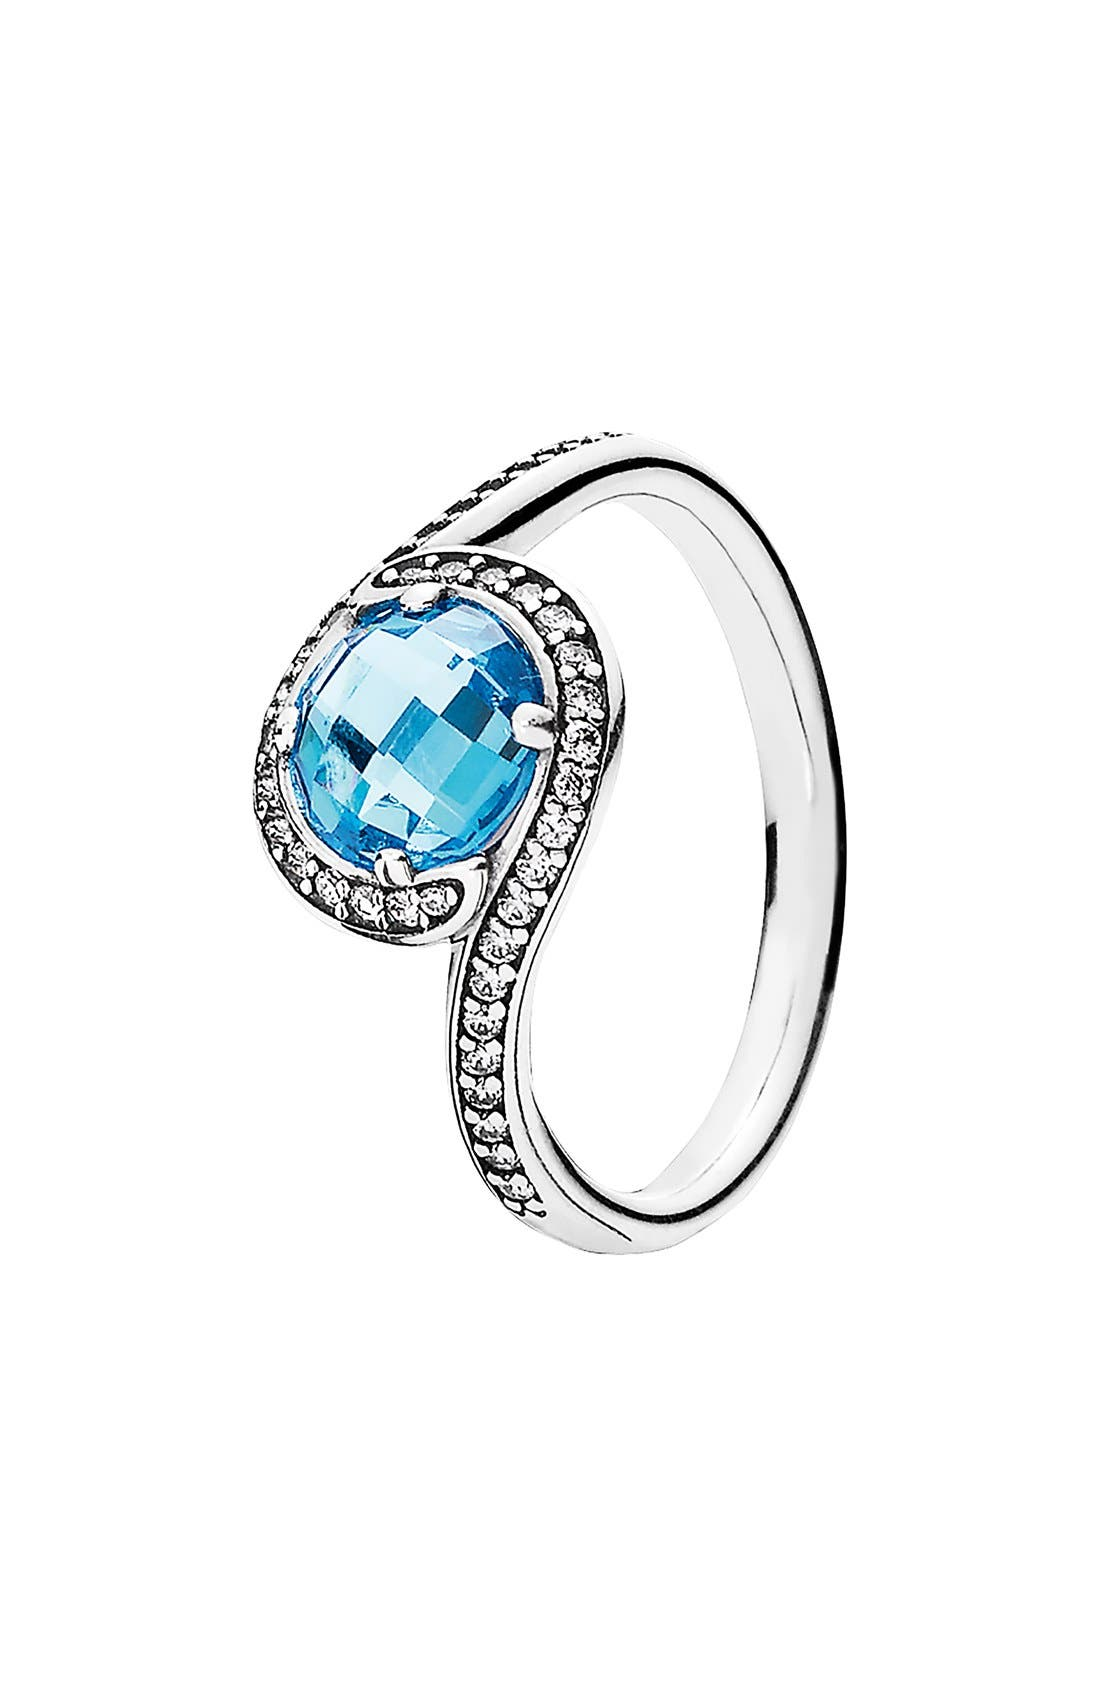 Alternate Image 1 Selected - PANDORA 'Radiant Embellish' Cubic Zirconia Ring